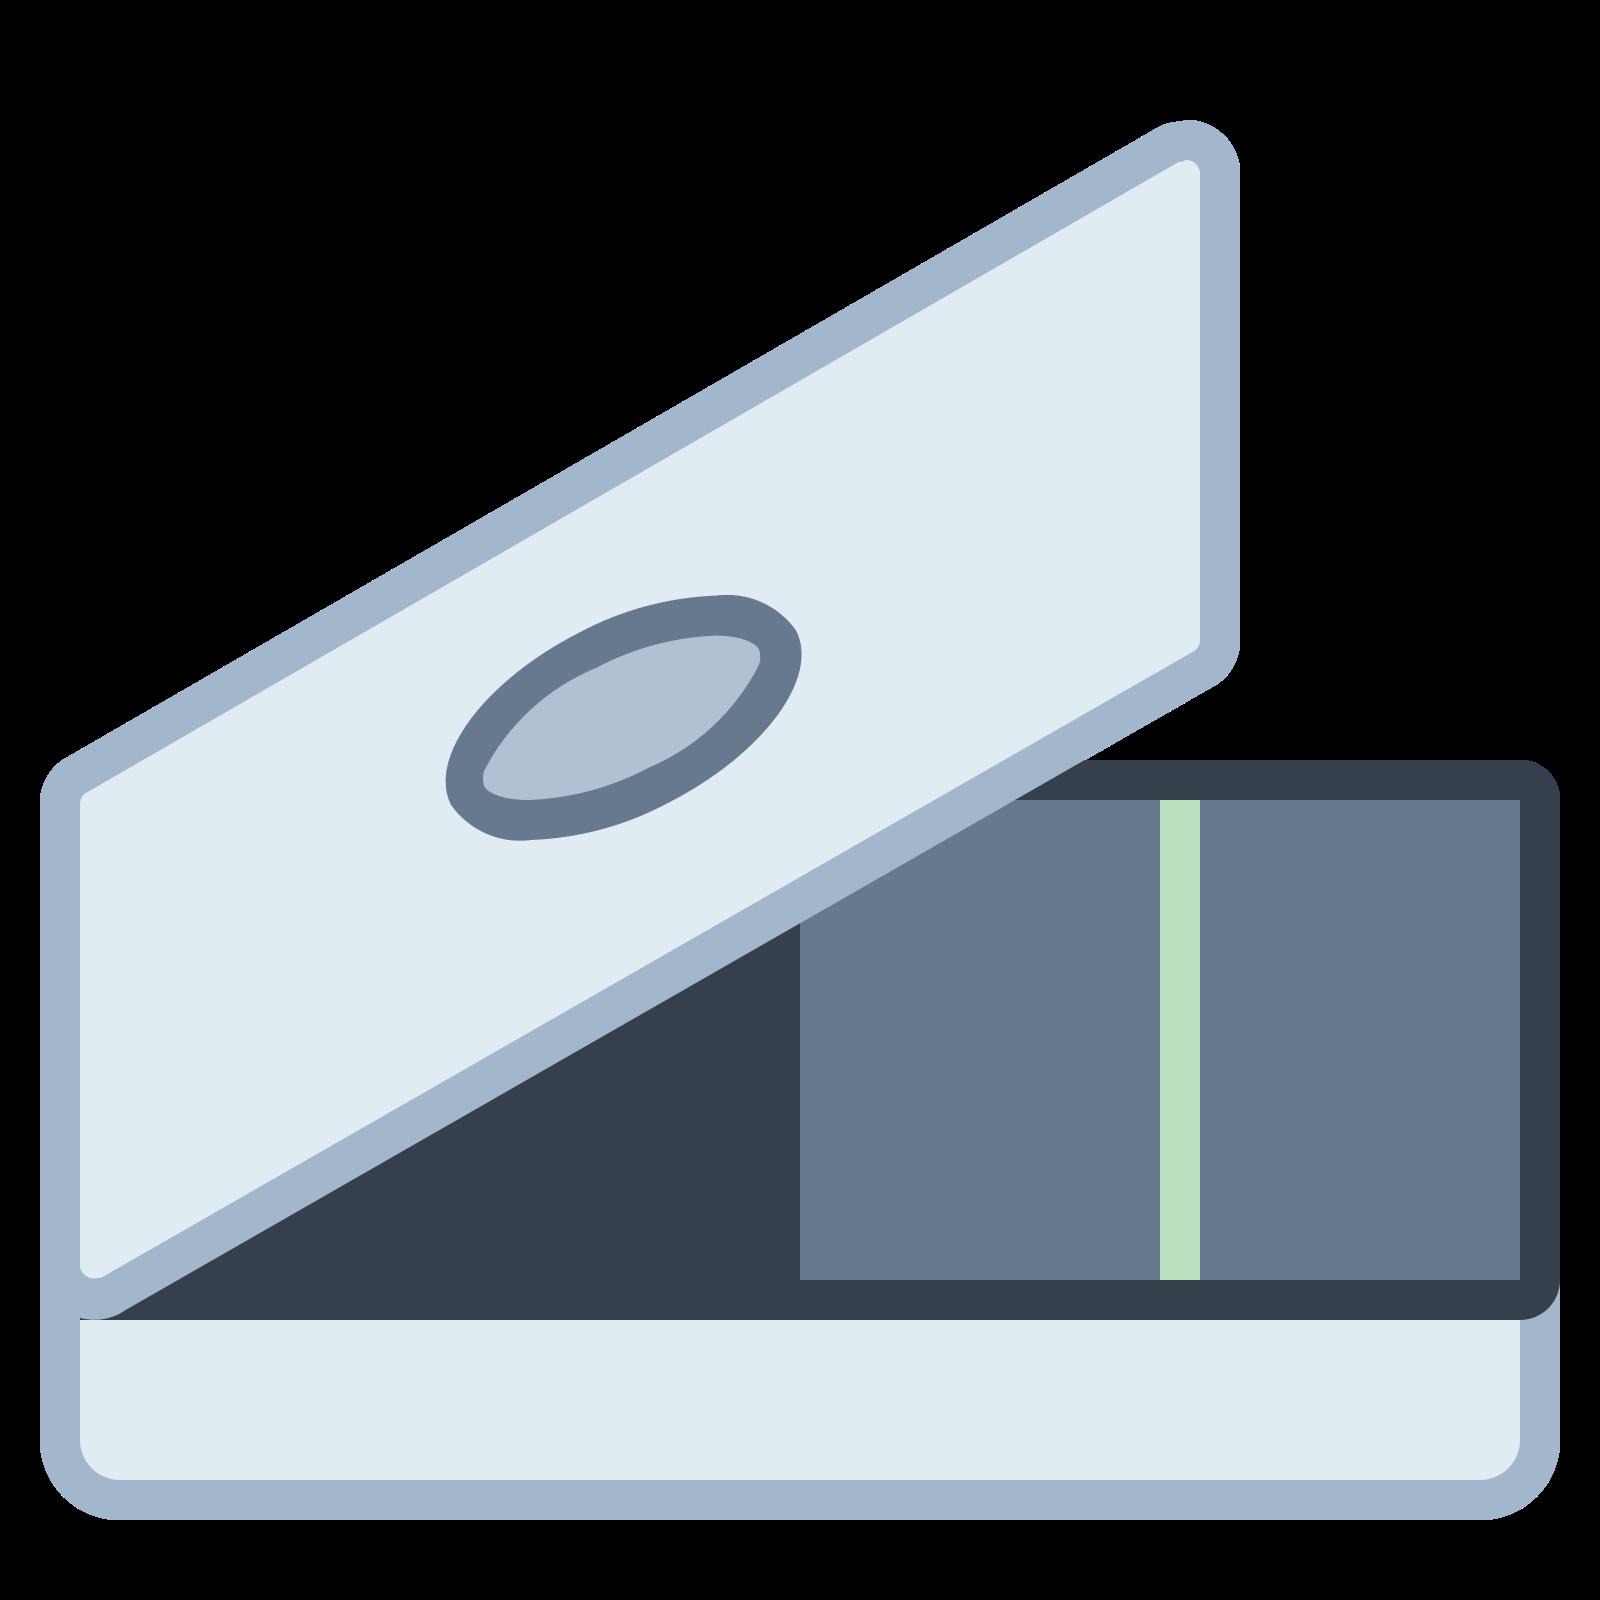 Skaner icon